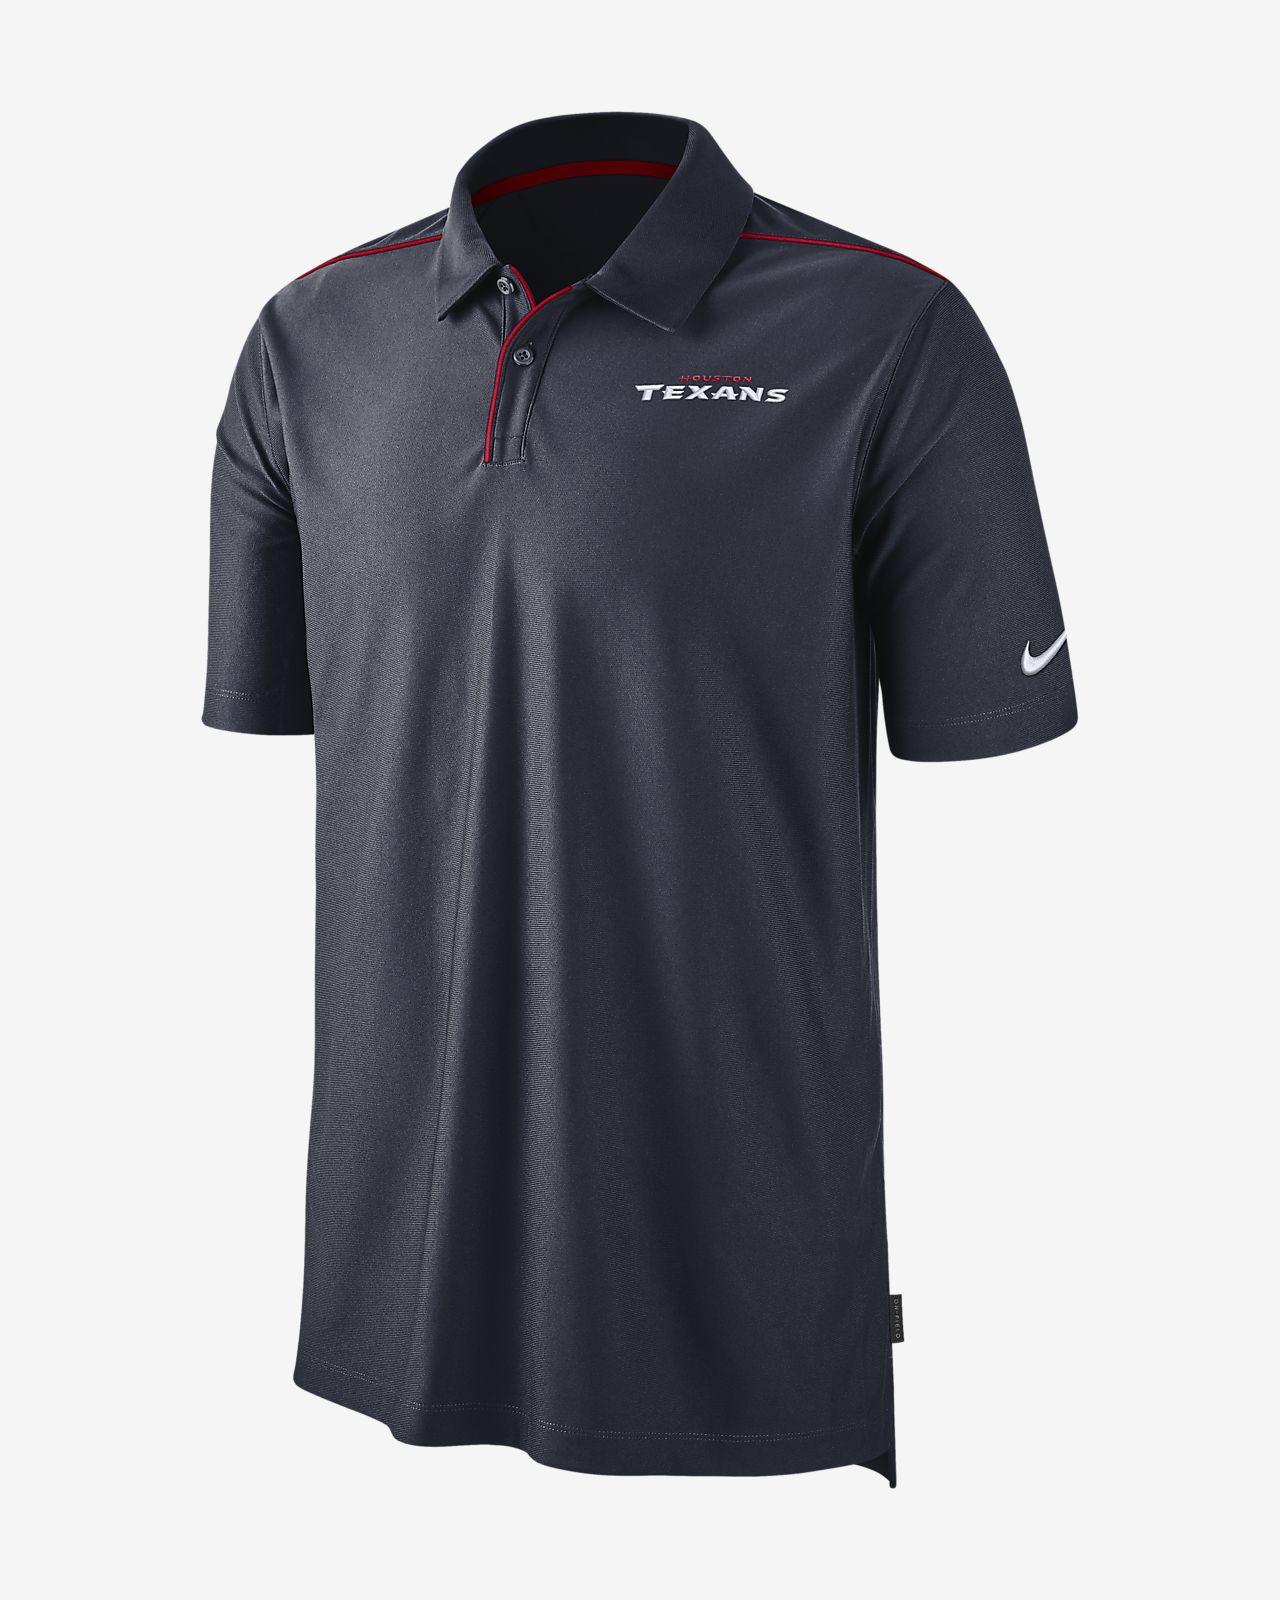 c1a72efc Nike Dri-FIT Team Issue (NFL Texans) Men's Polo